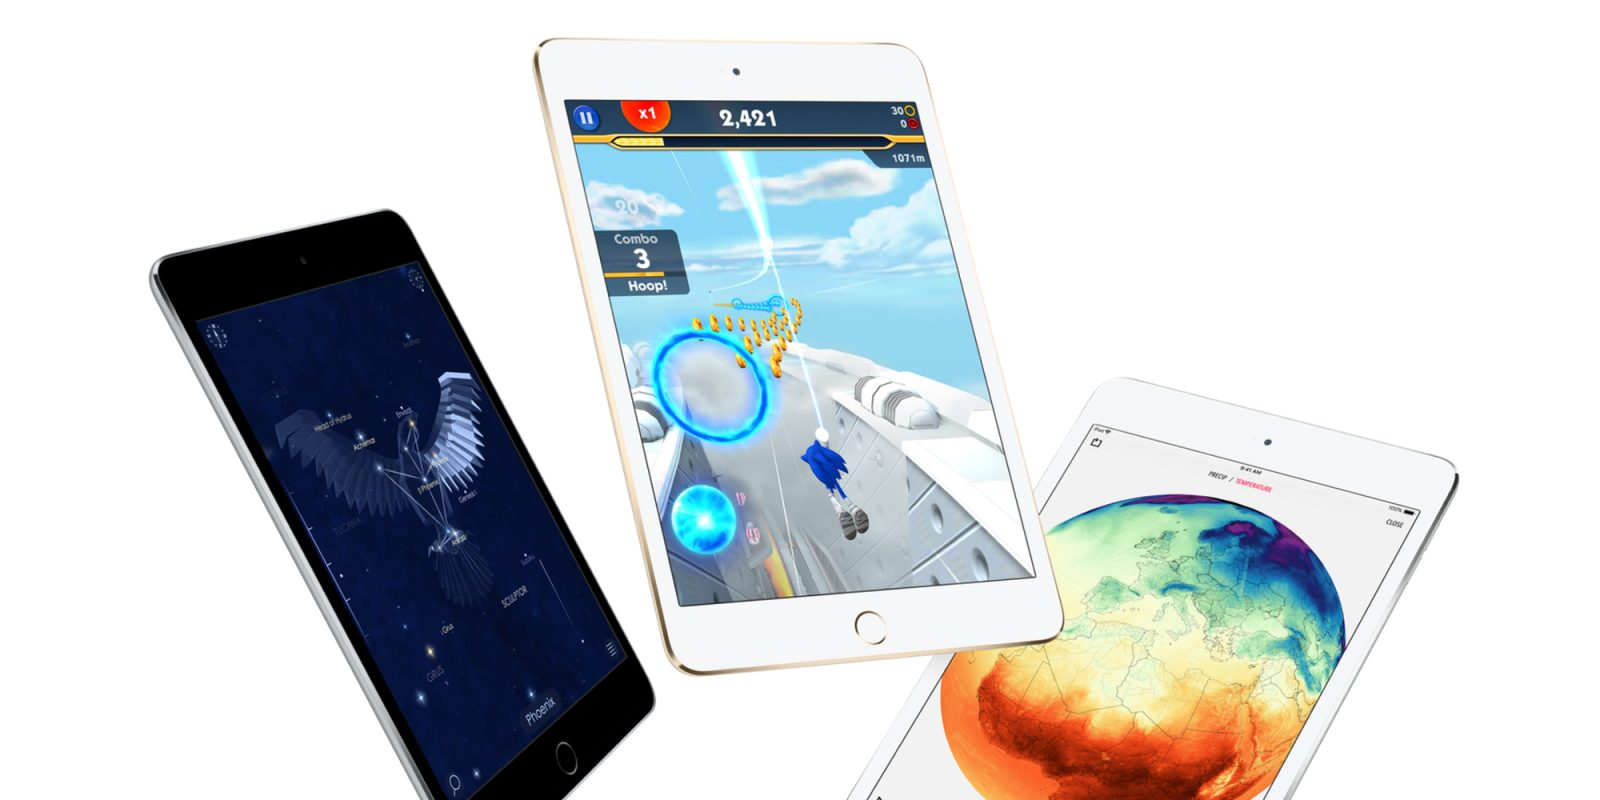 iPad mini 4 Wi-Fi 128GB drops to $250 shipped ahead of Tuesday's Apple event (Reg. $399)